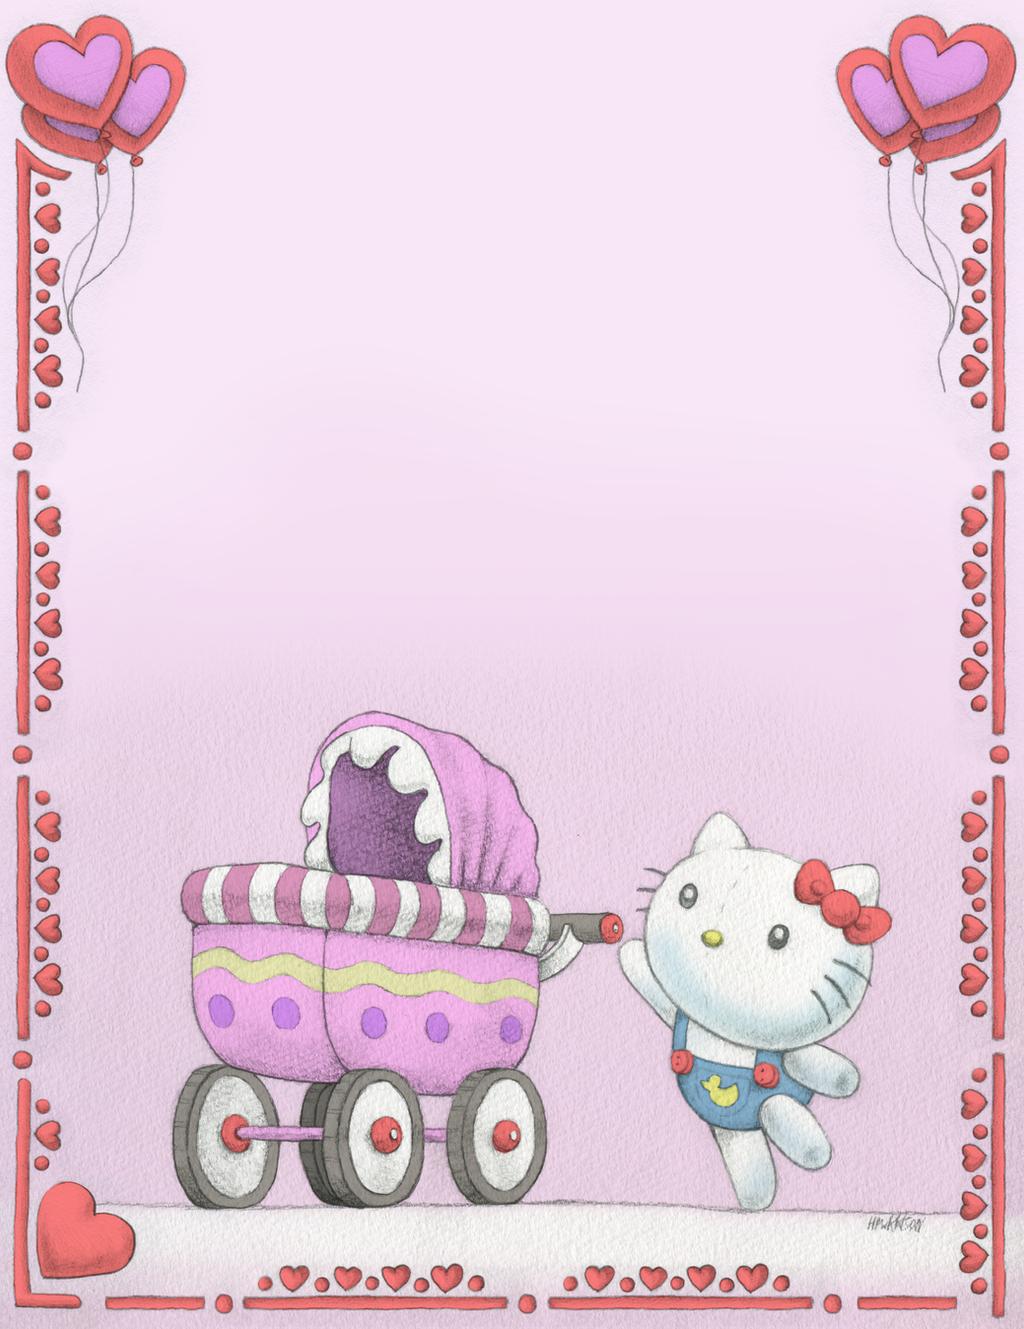 Hello Kitty - Baby Shower Card by CVGZ-Kris on DeviantArt